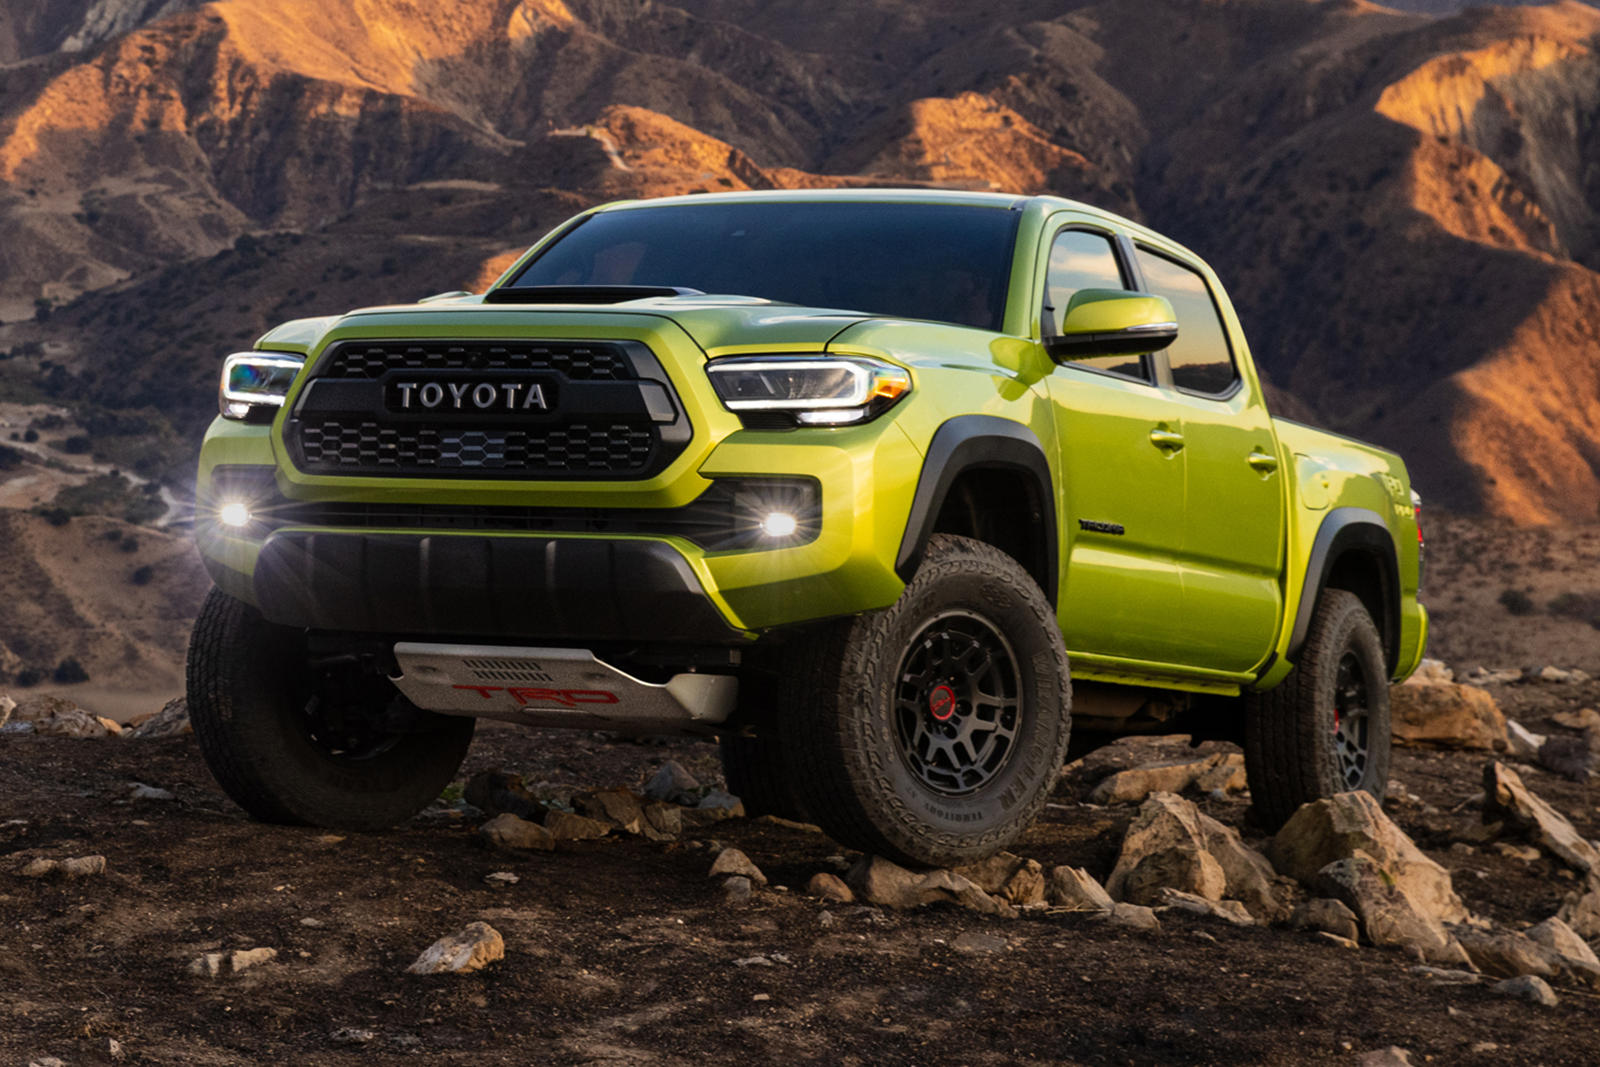 Toyota-ra-mắt-Tacoma-TRD-Pro-2022 (1).jpg